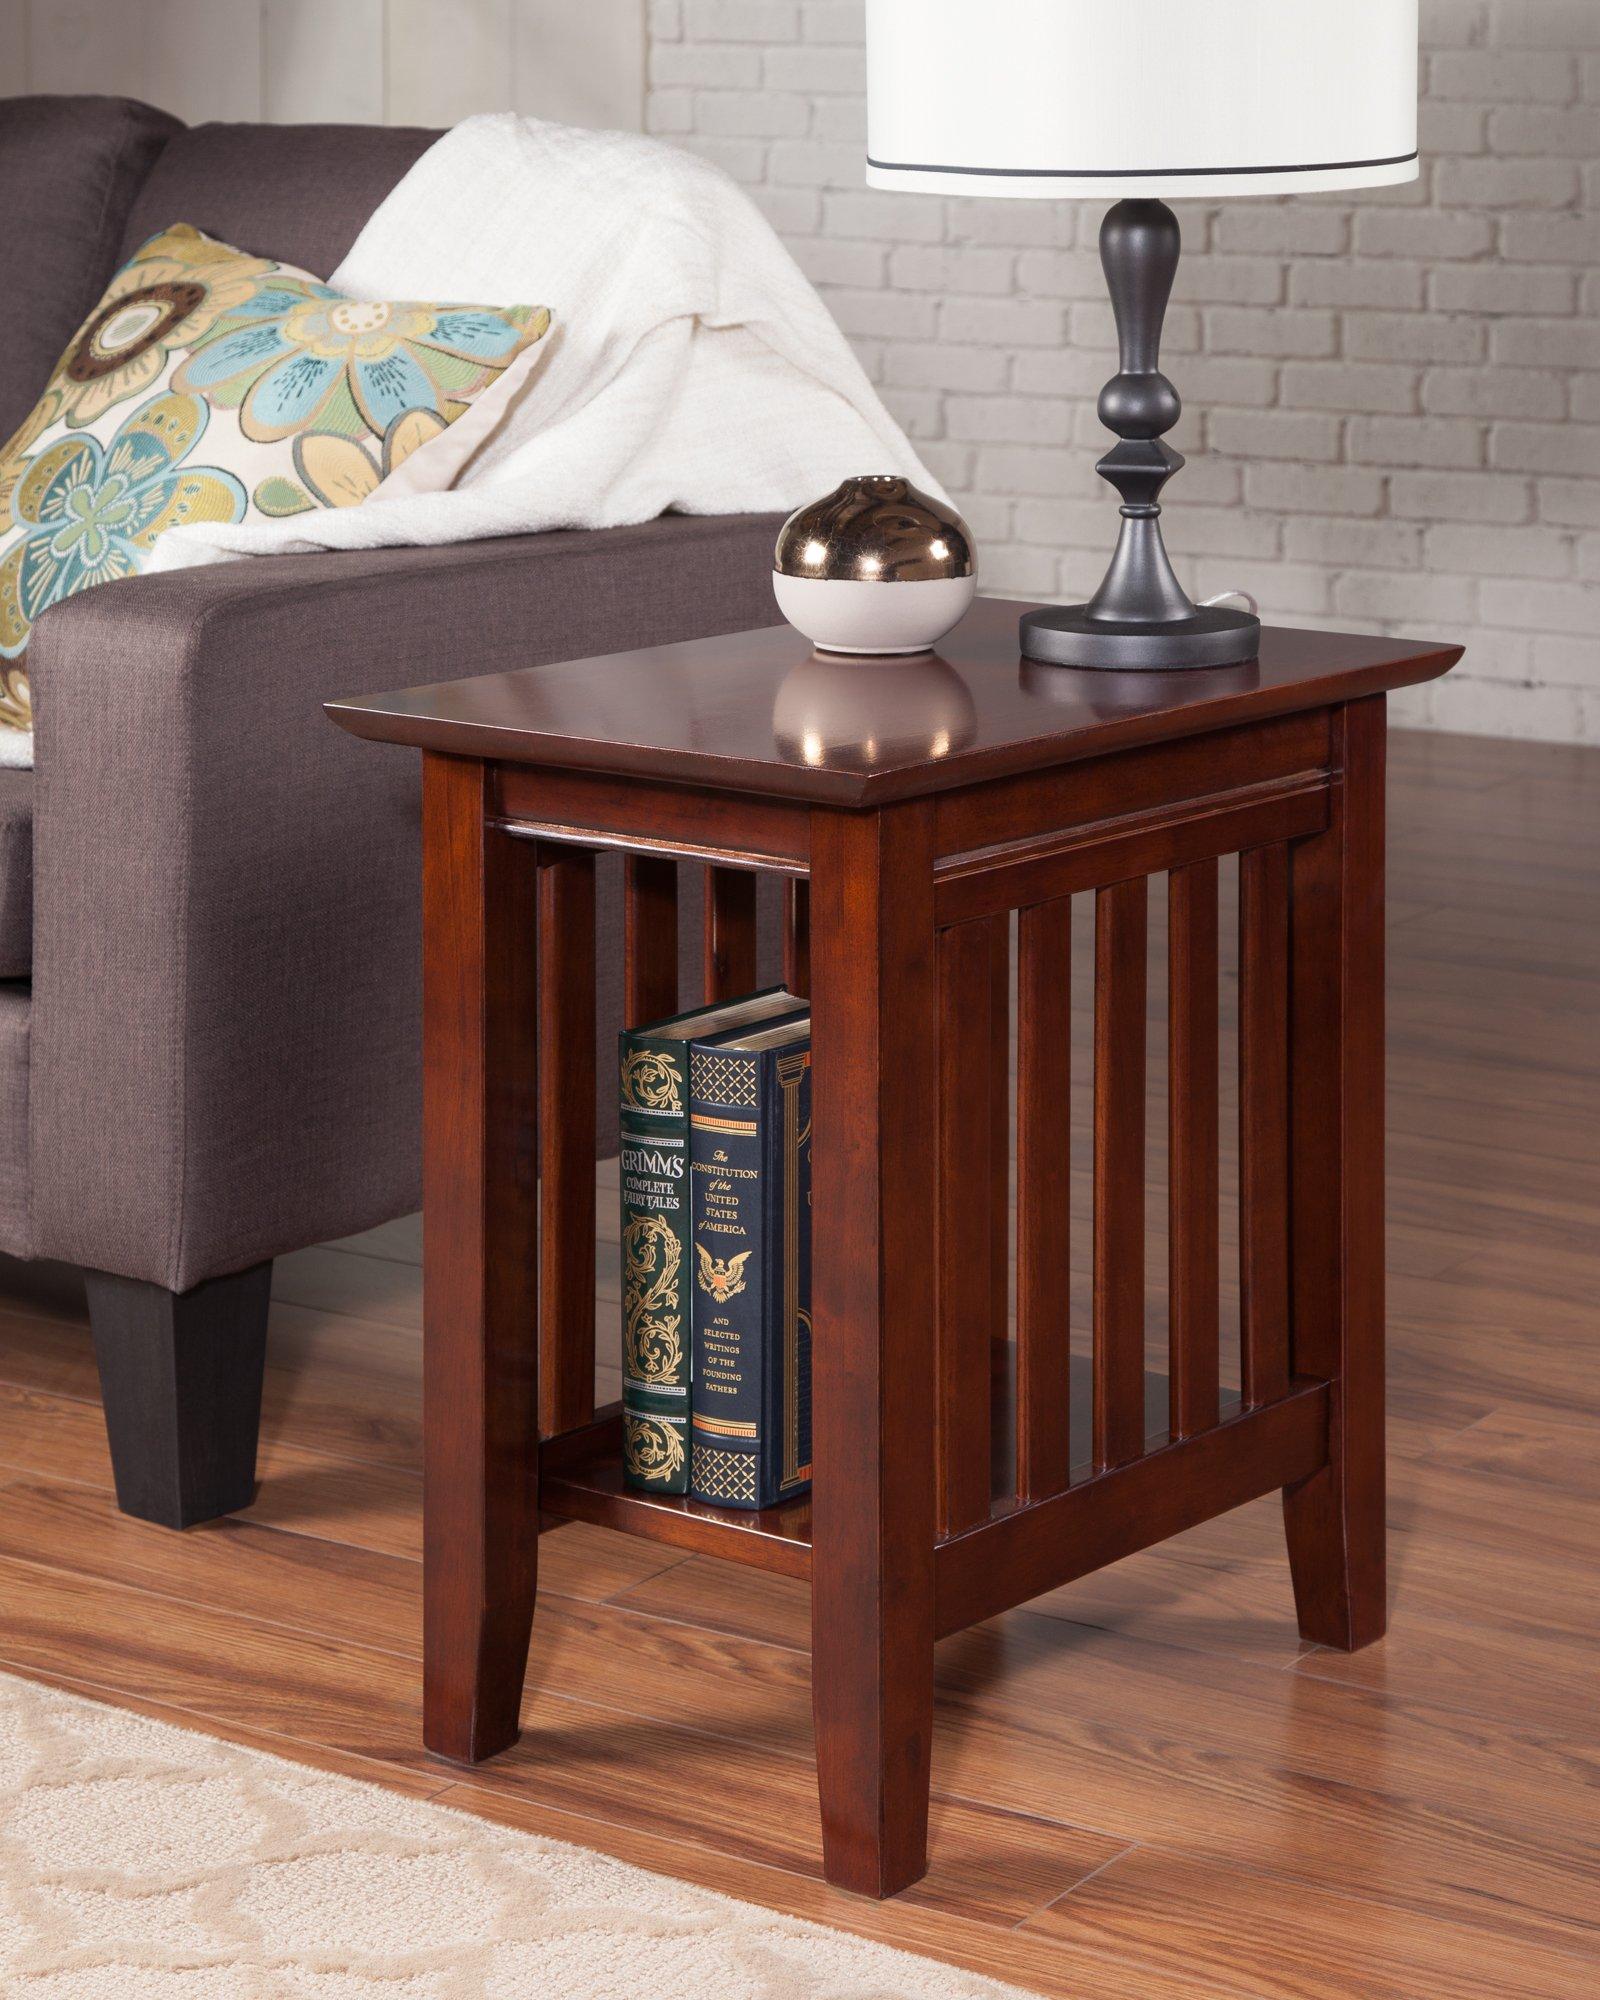 Atlantic Furniture AH13204 Mission Side Table Rubber Wood, Walnut